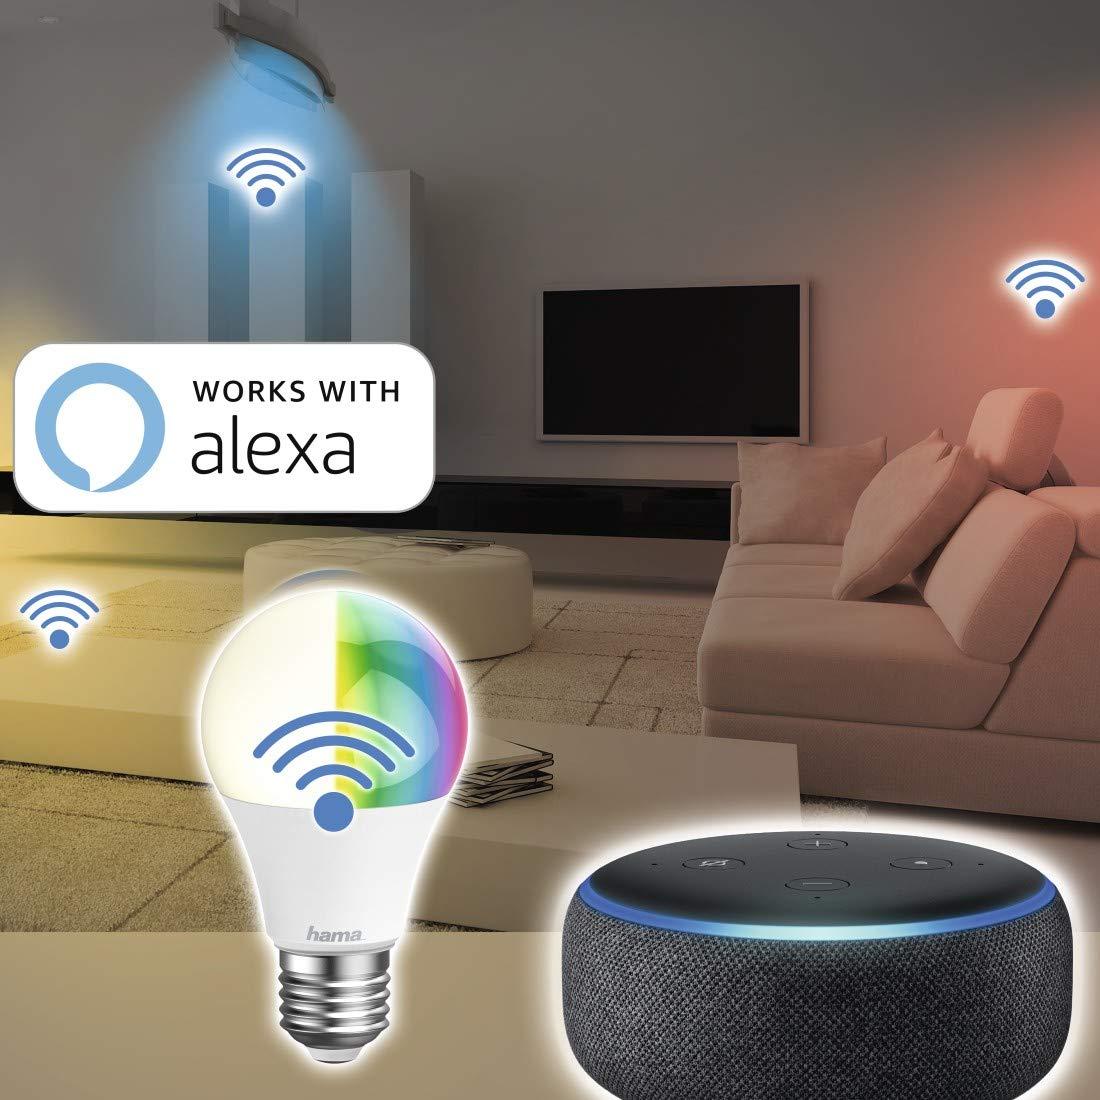 WLAN Lampe Hama E27 Wi-Fi LED-Lampe dimmbar 10 Watt ohne Hub RGB Farbwechsel steuerbar via Alexa//Google Home//App//IFTTT warmwei/ß Echo Dot//Echo Spot//Echo Plus//Echo Show kompatibel 2,4GHz 2700K